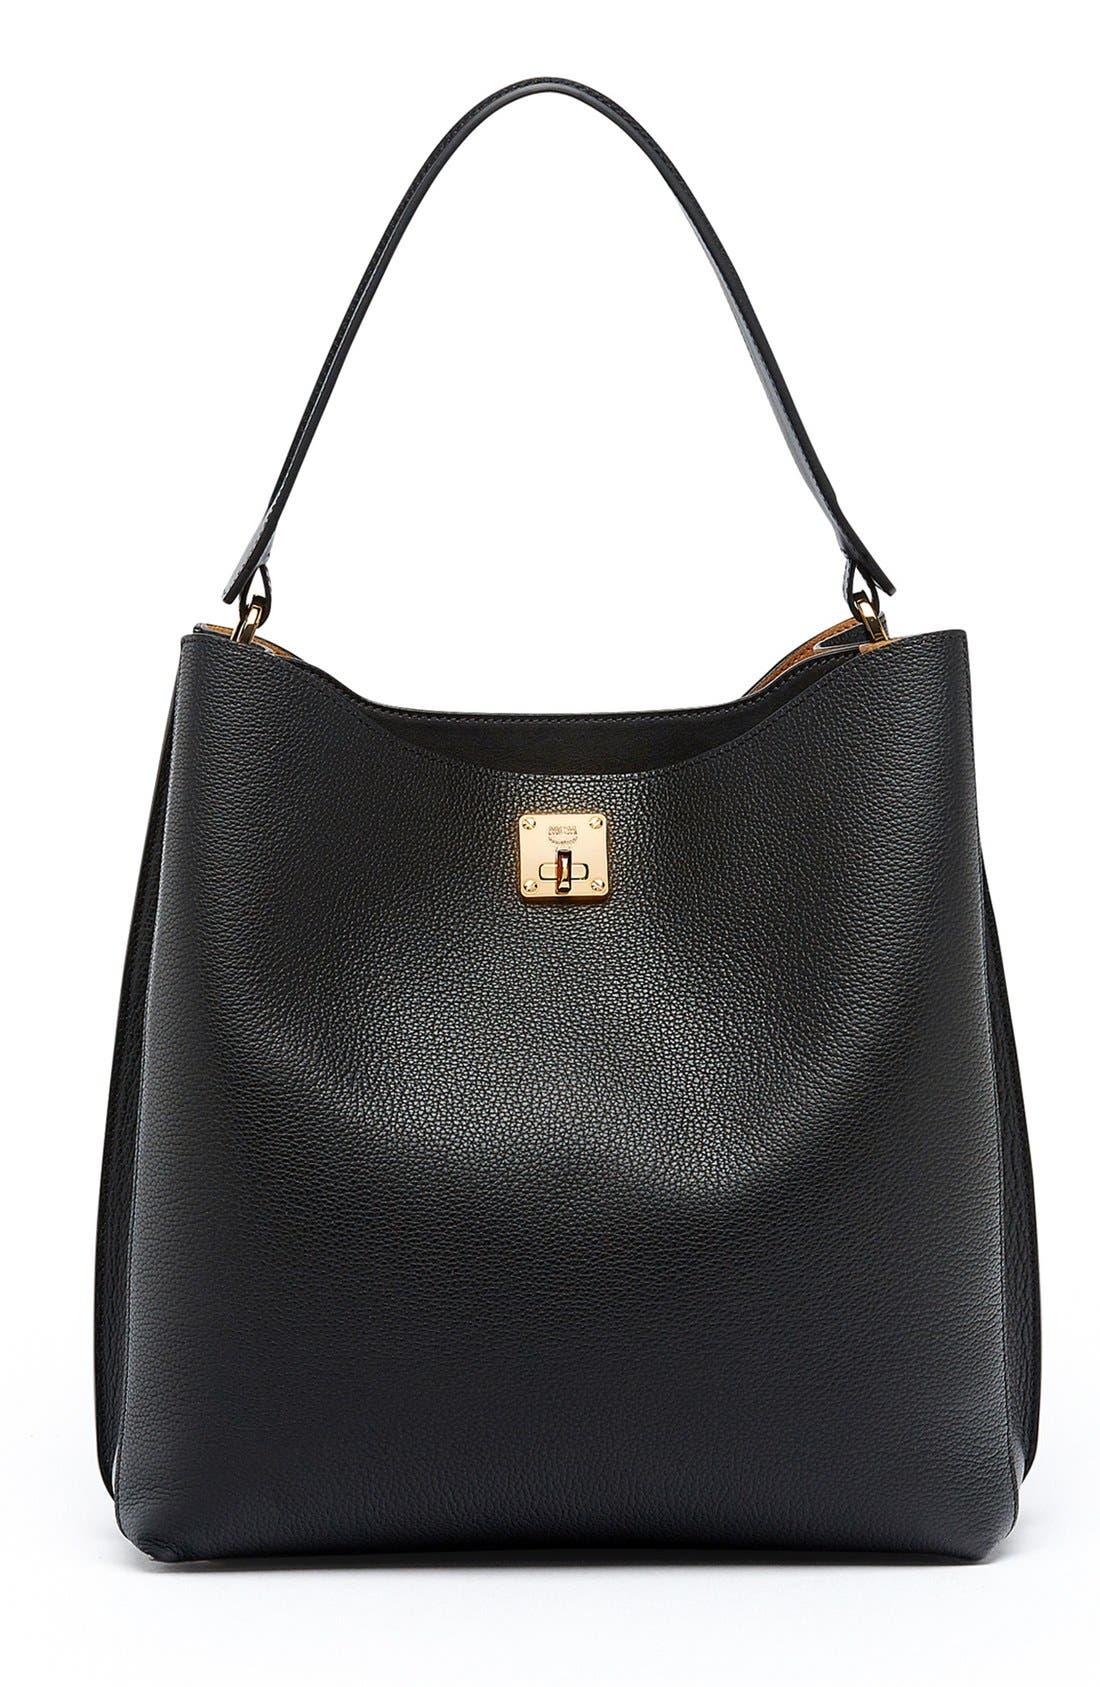 MCM 'Large Milla' Leather Hobo